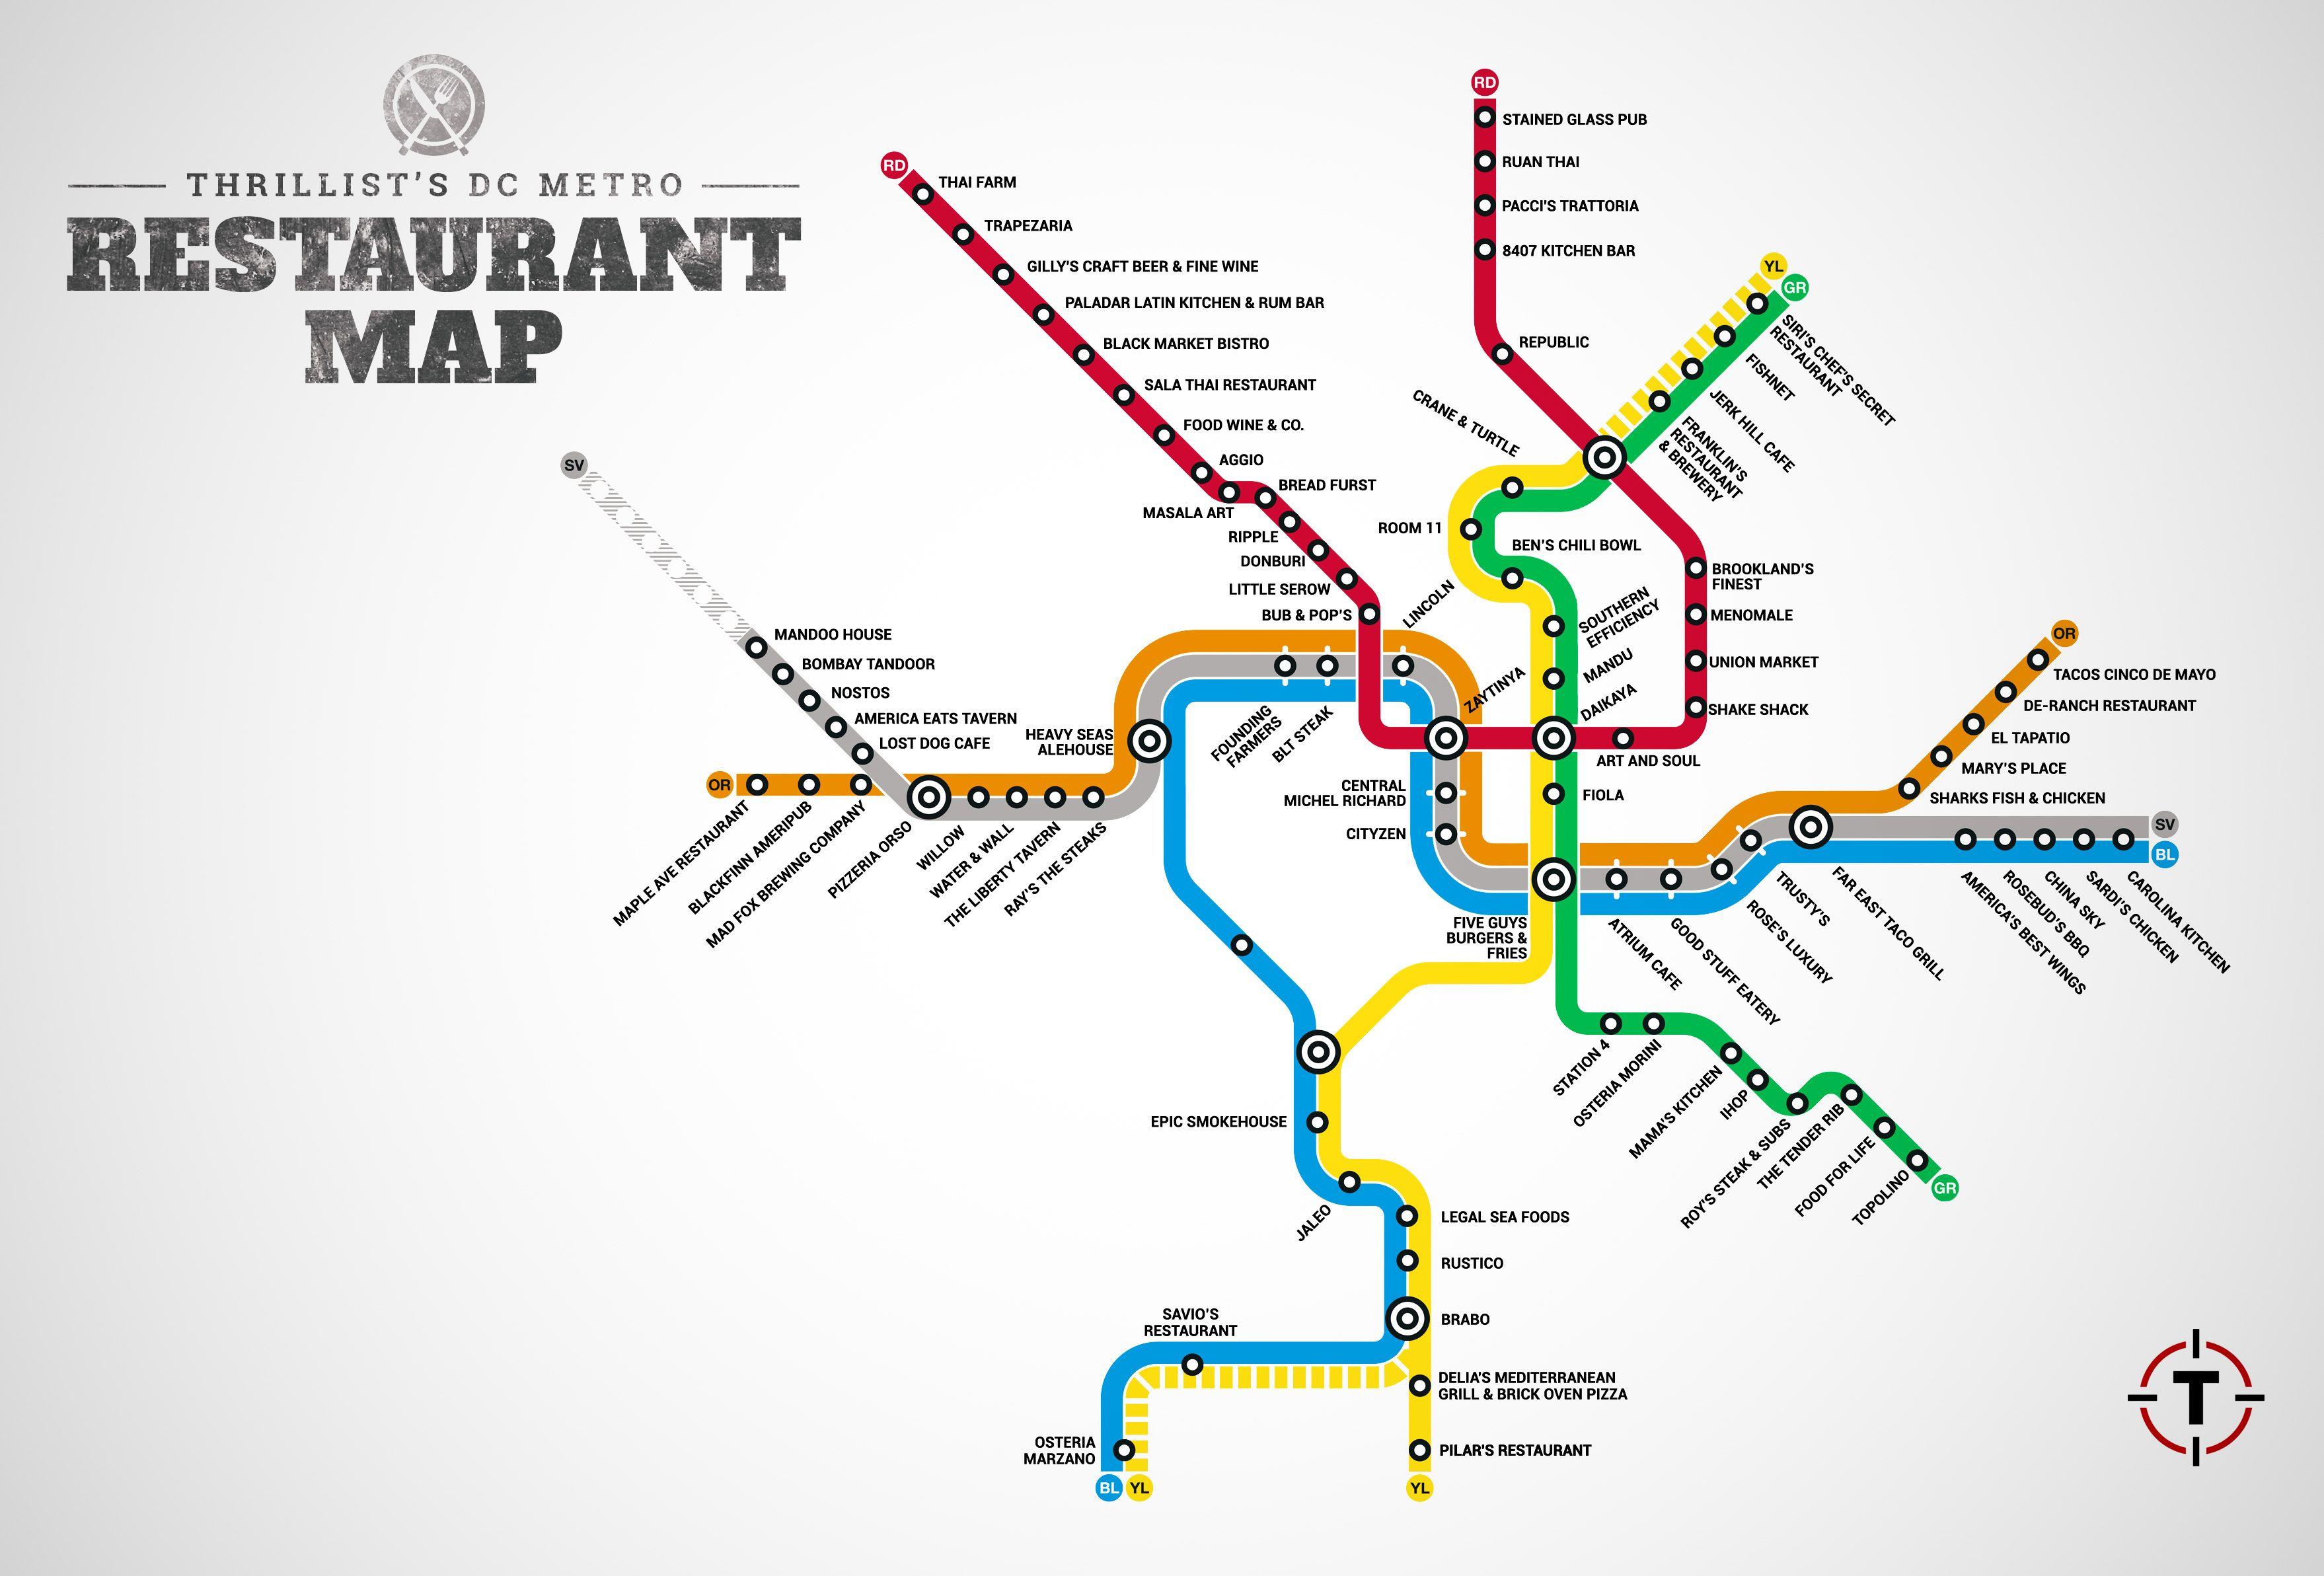 DC Metro Restaurant Map http://www.thrillist.com/eat/washington-dc ...